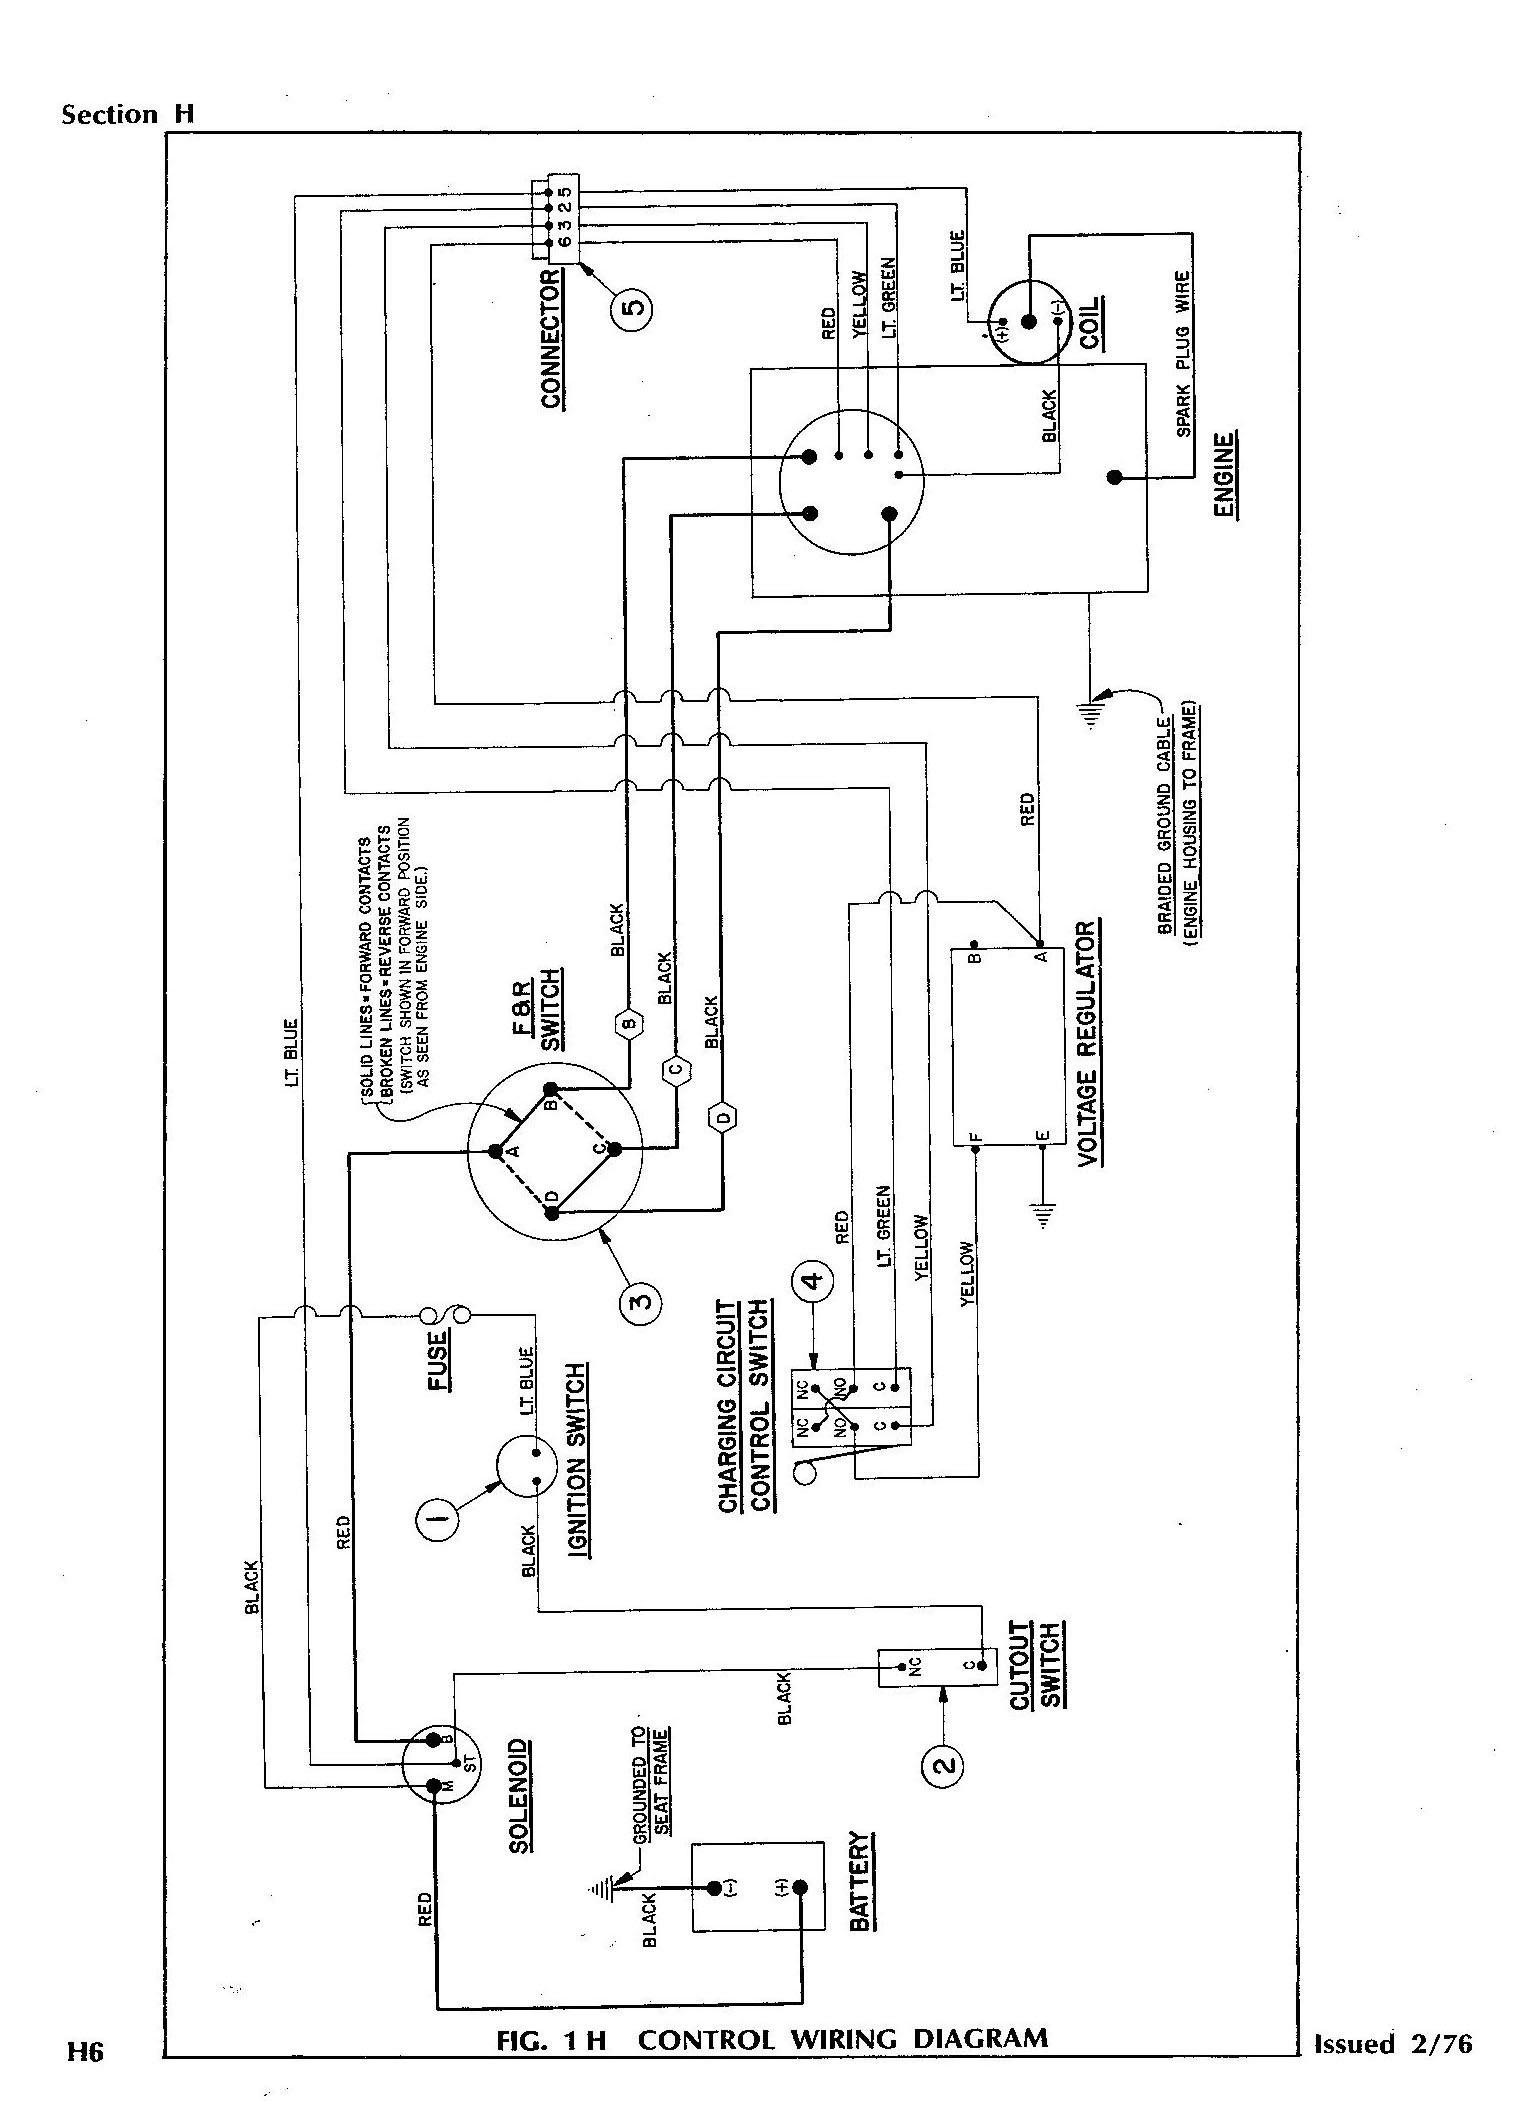 hight resolution of yamaha electric golf cart wiring g27e wiring diagram data nameyamaha golf cart wiring diagram g16 elc